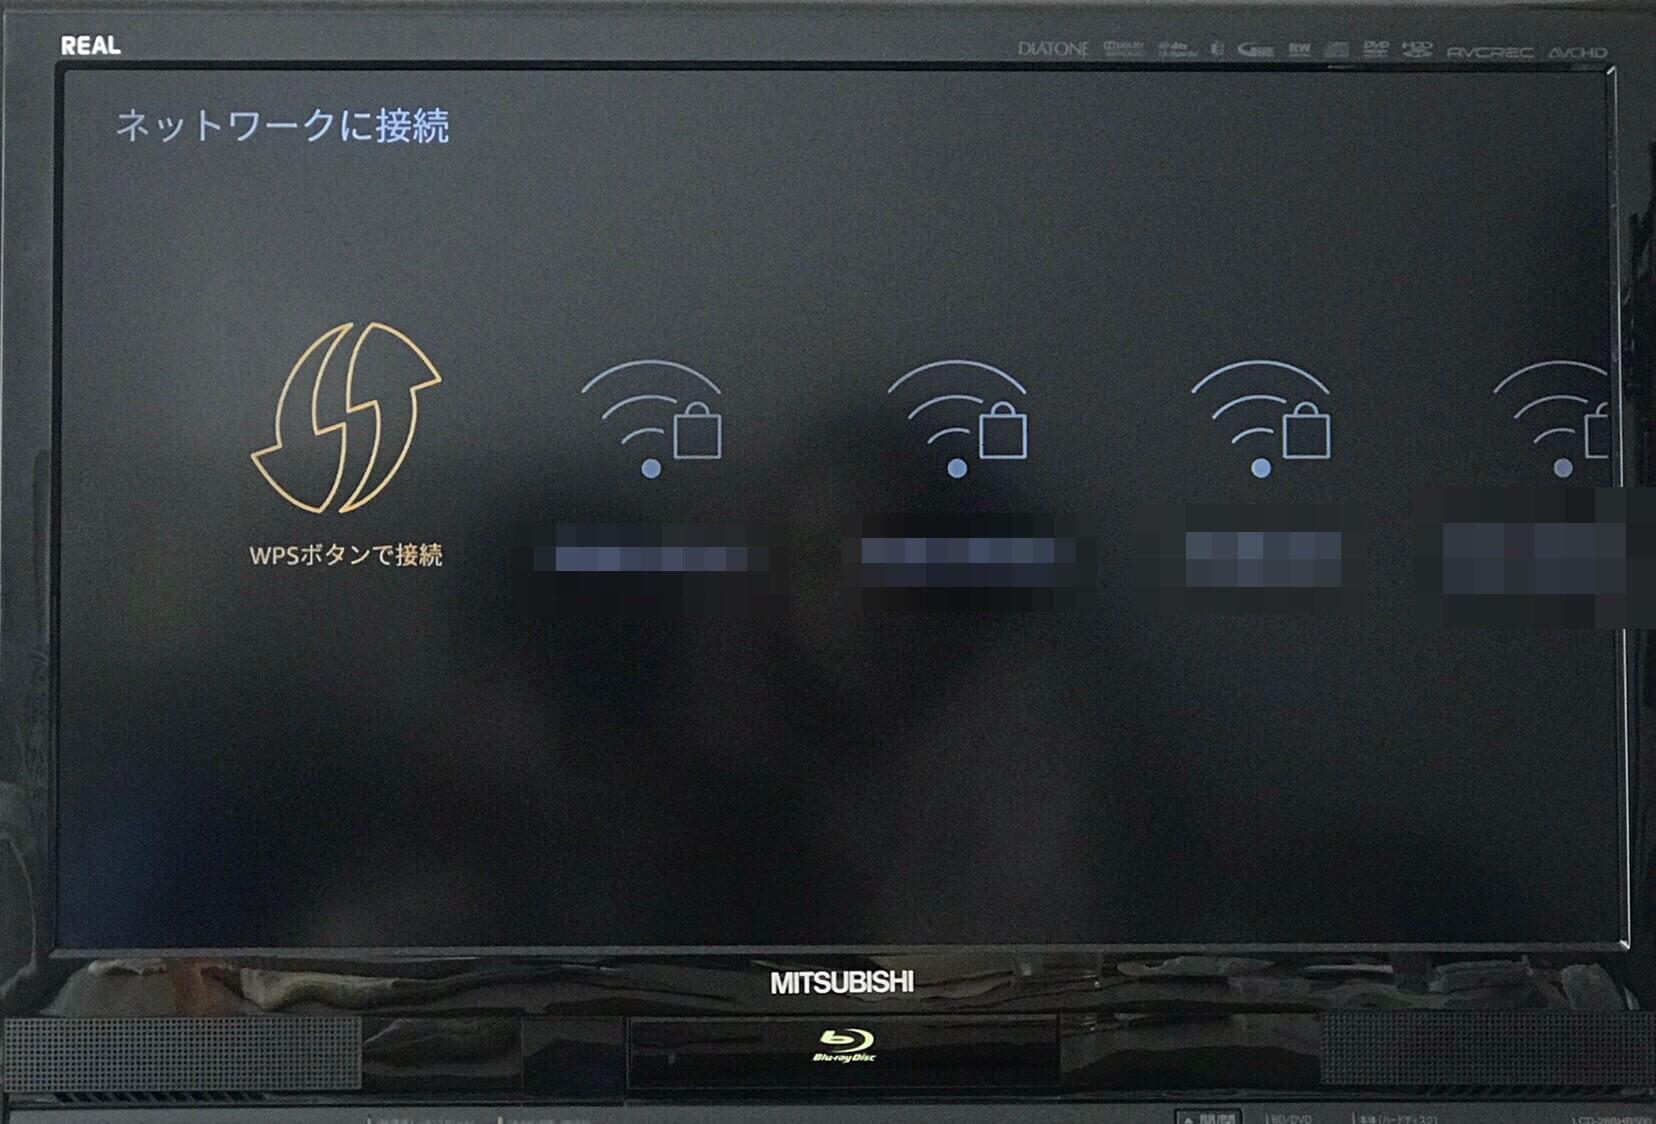 Fire TV Stick 4kのネットワーク選択画面